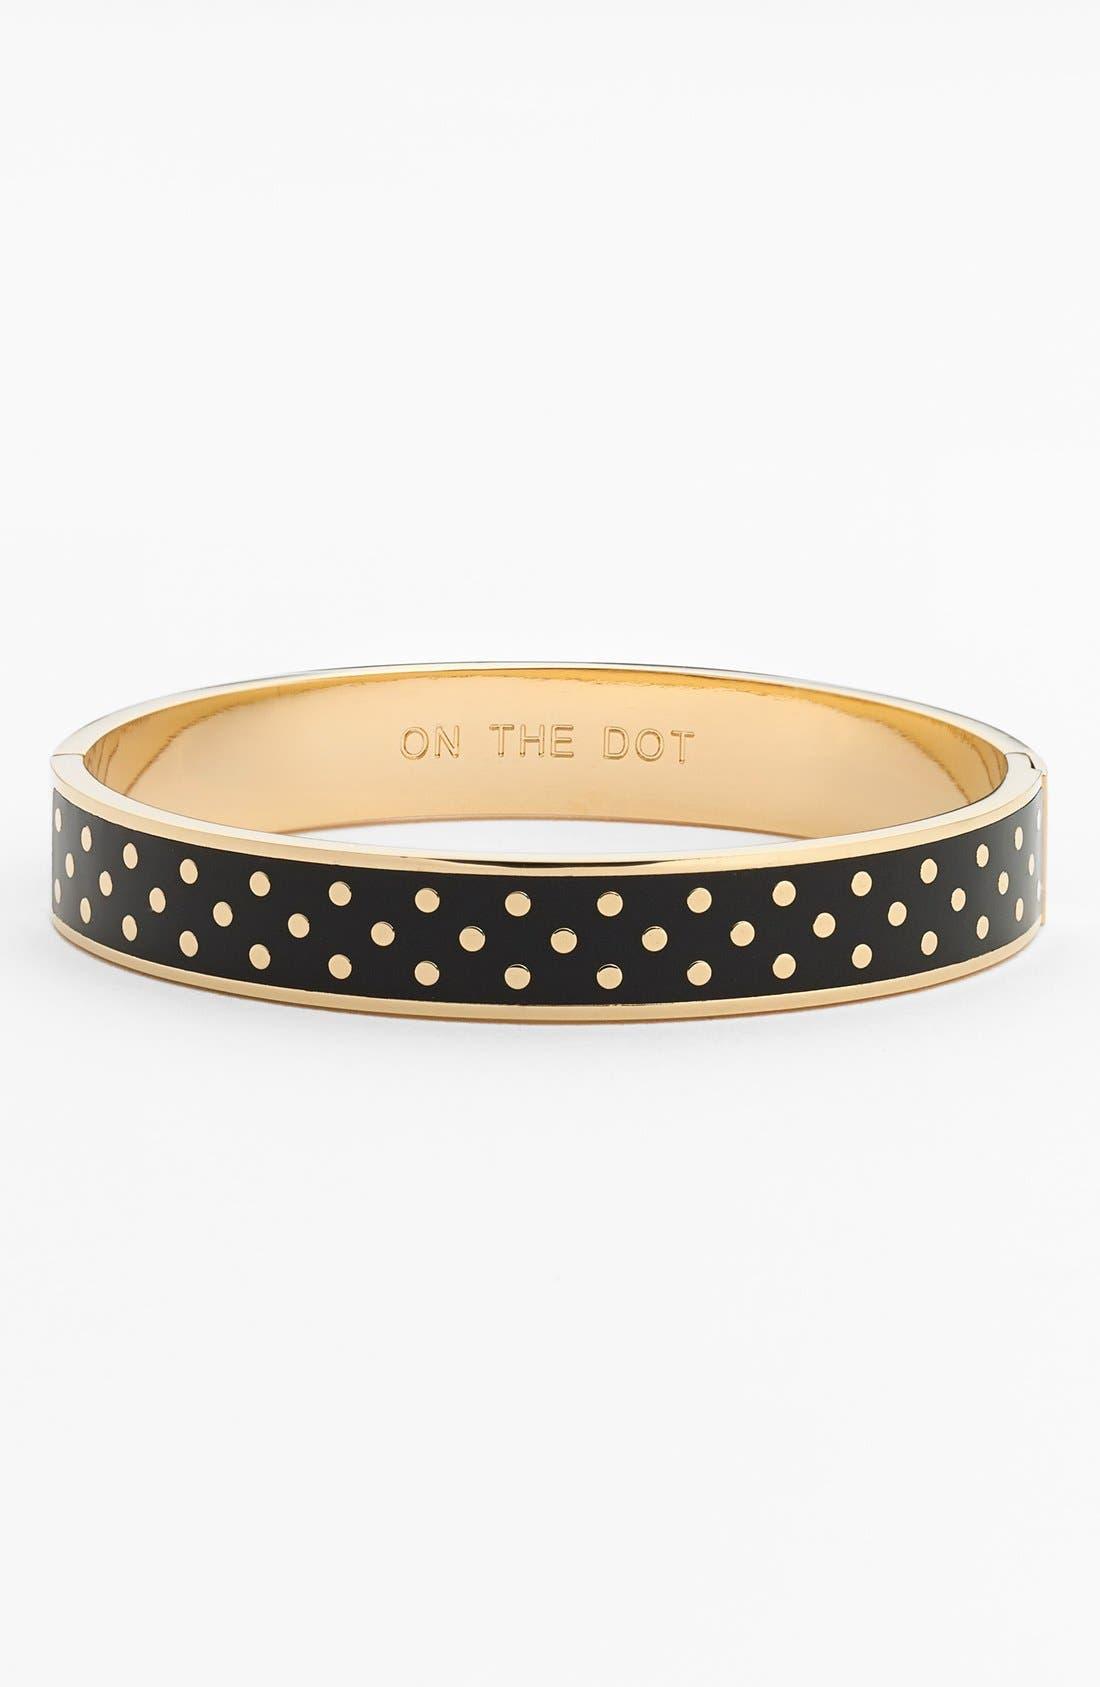 Alternate Image 1 Selected - kate spade new york 'on the dot' hinge idiom bracelet